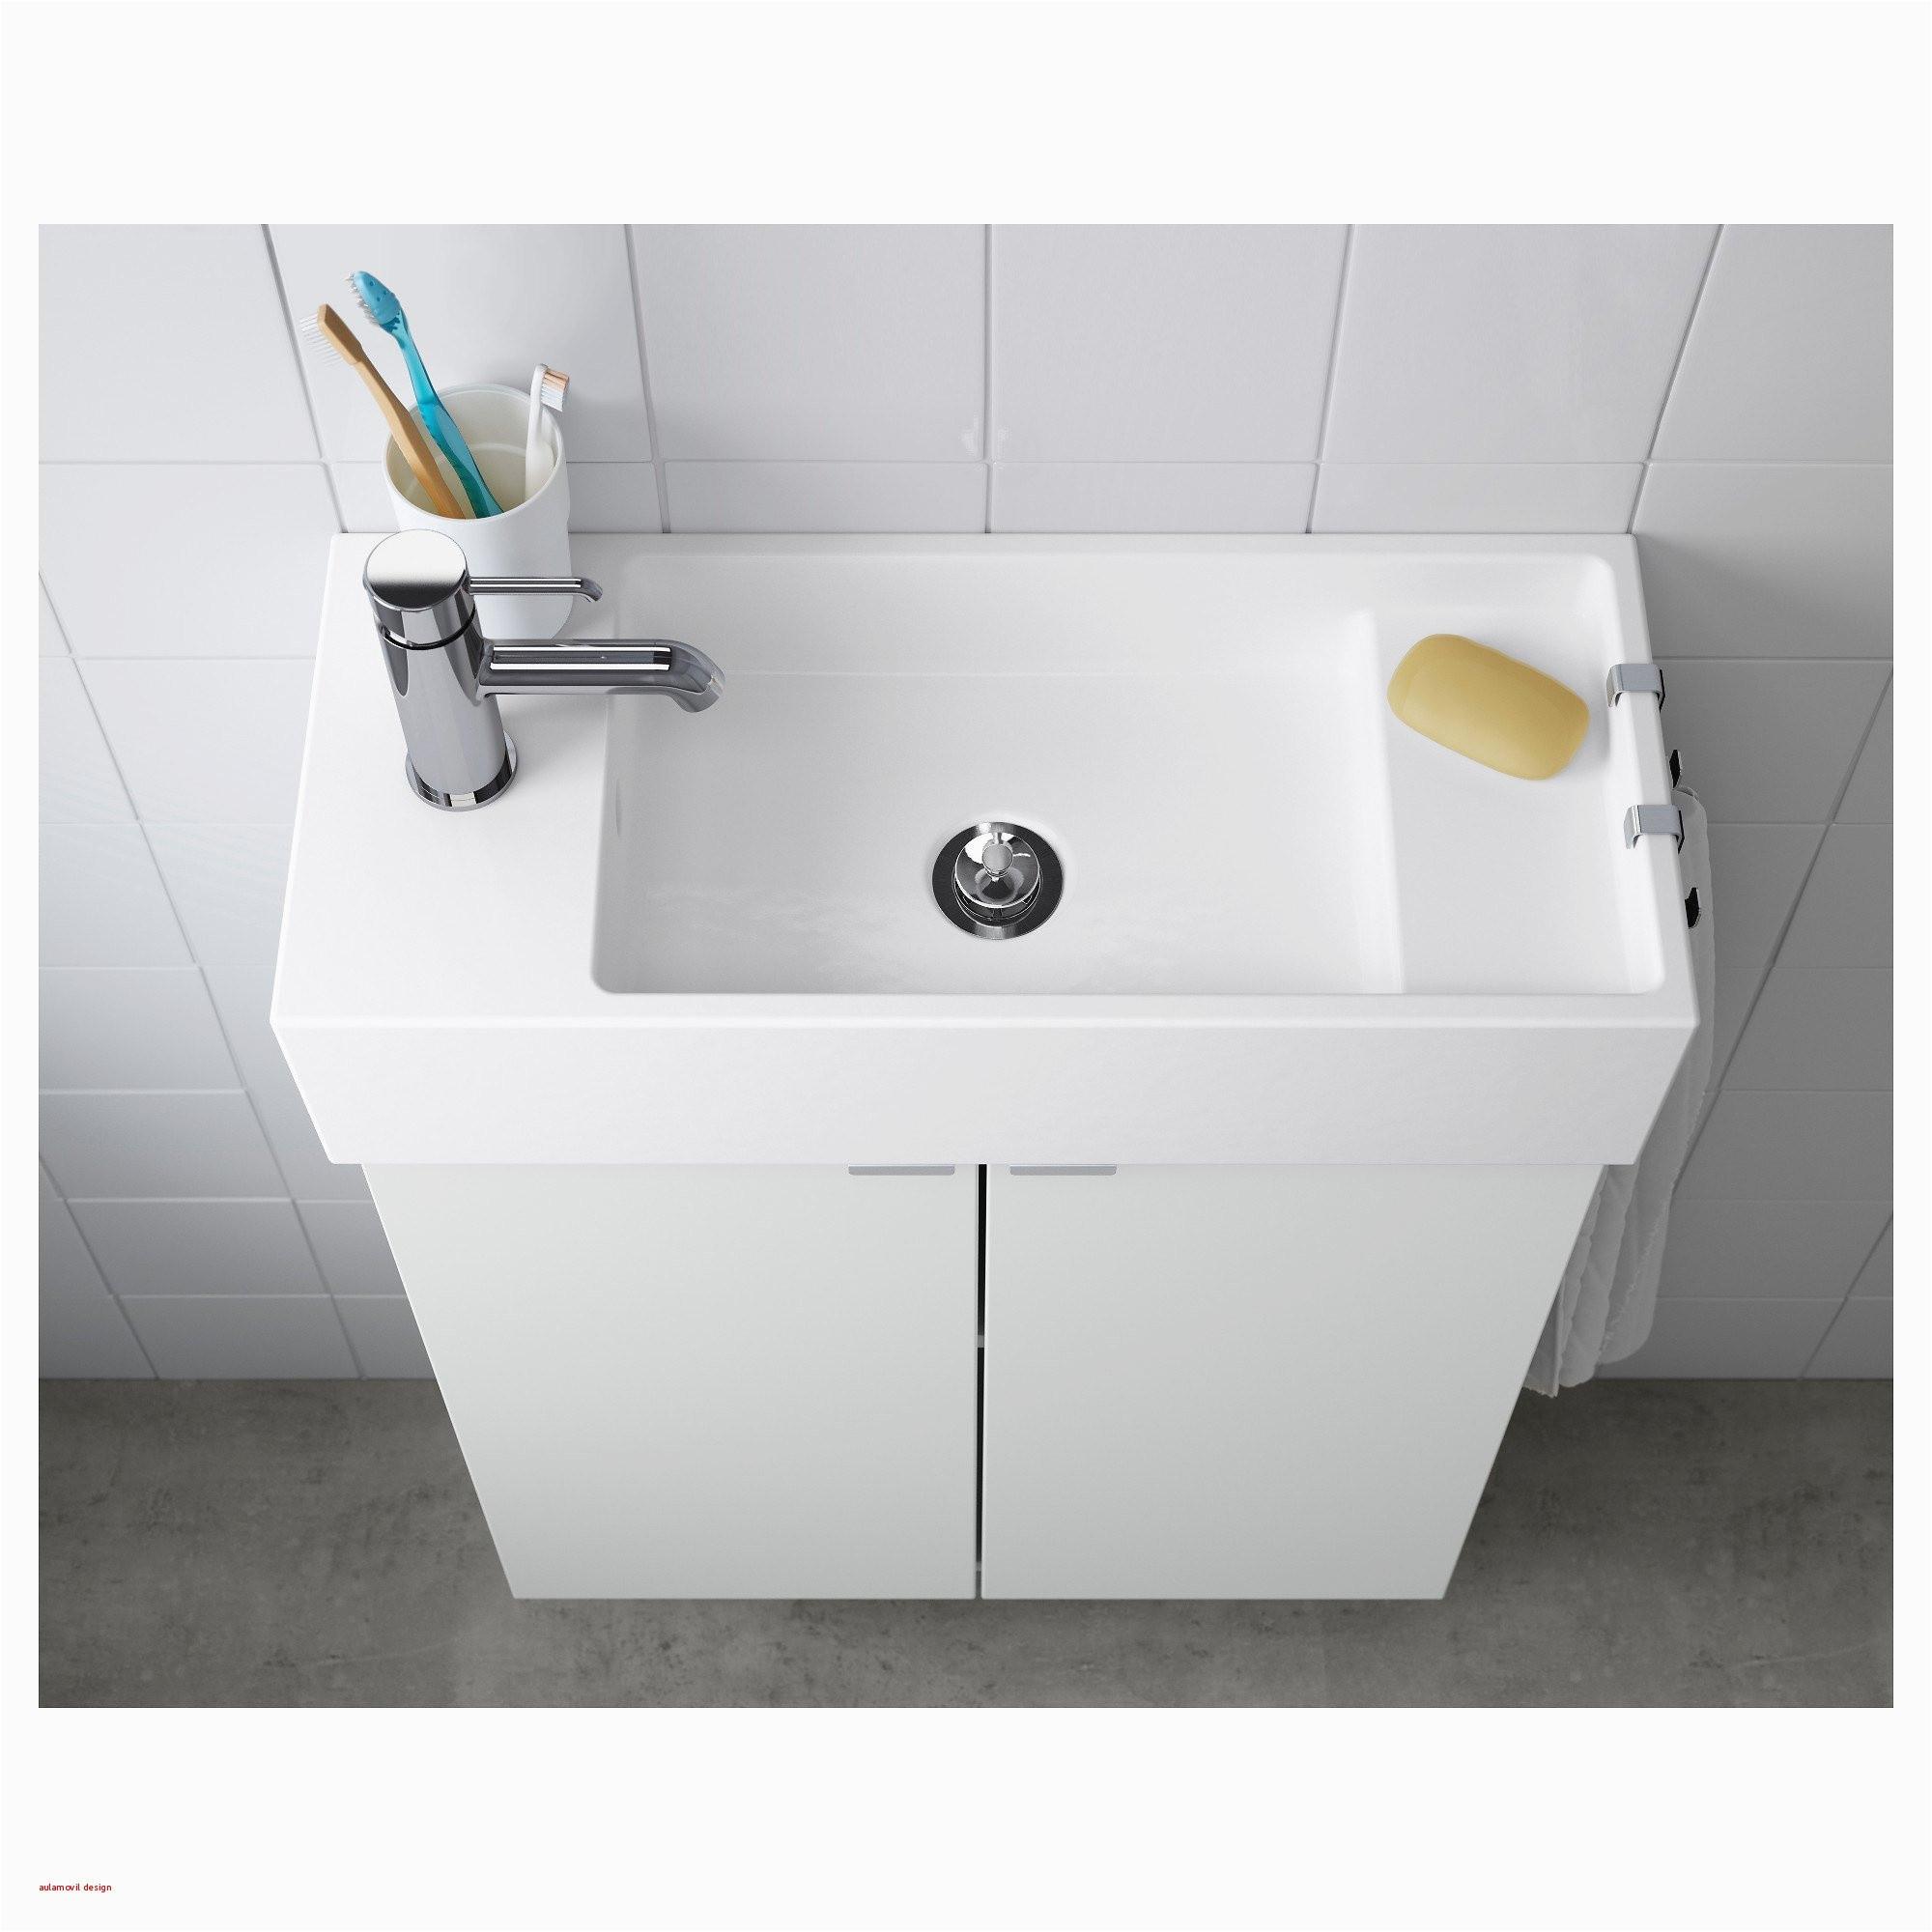 where to buy bathtubs lovely small bathtubs for small bathrooms small bathroom interior design